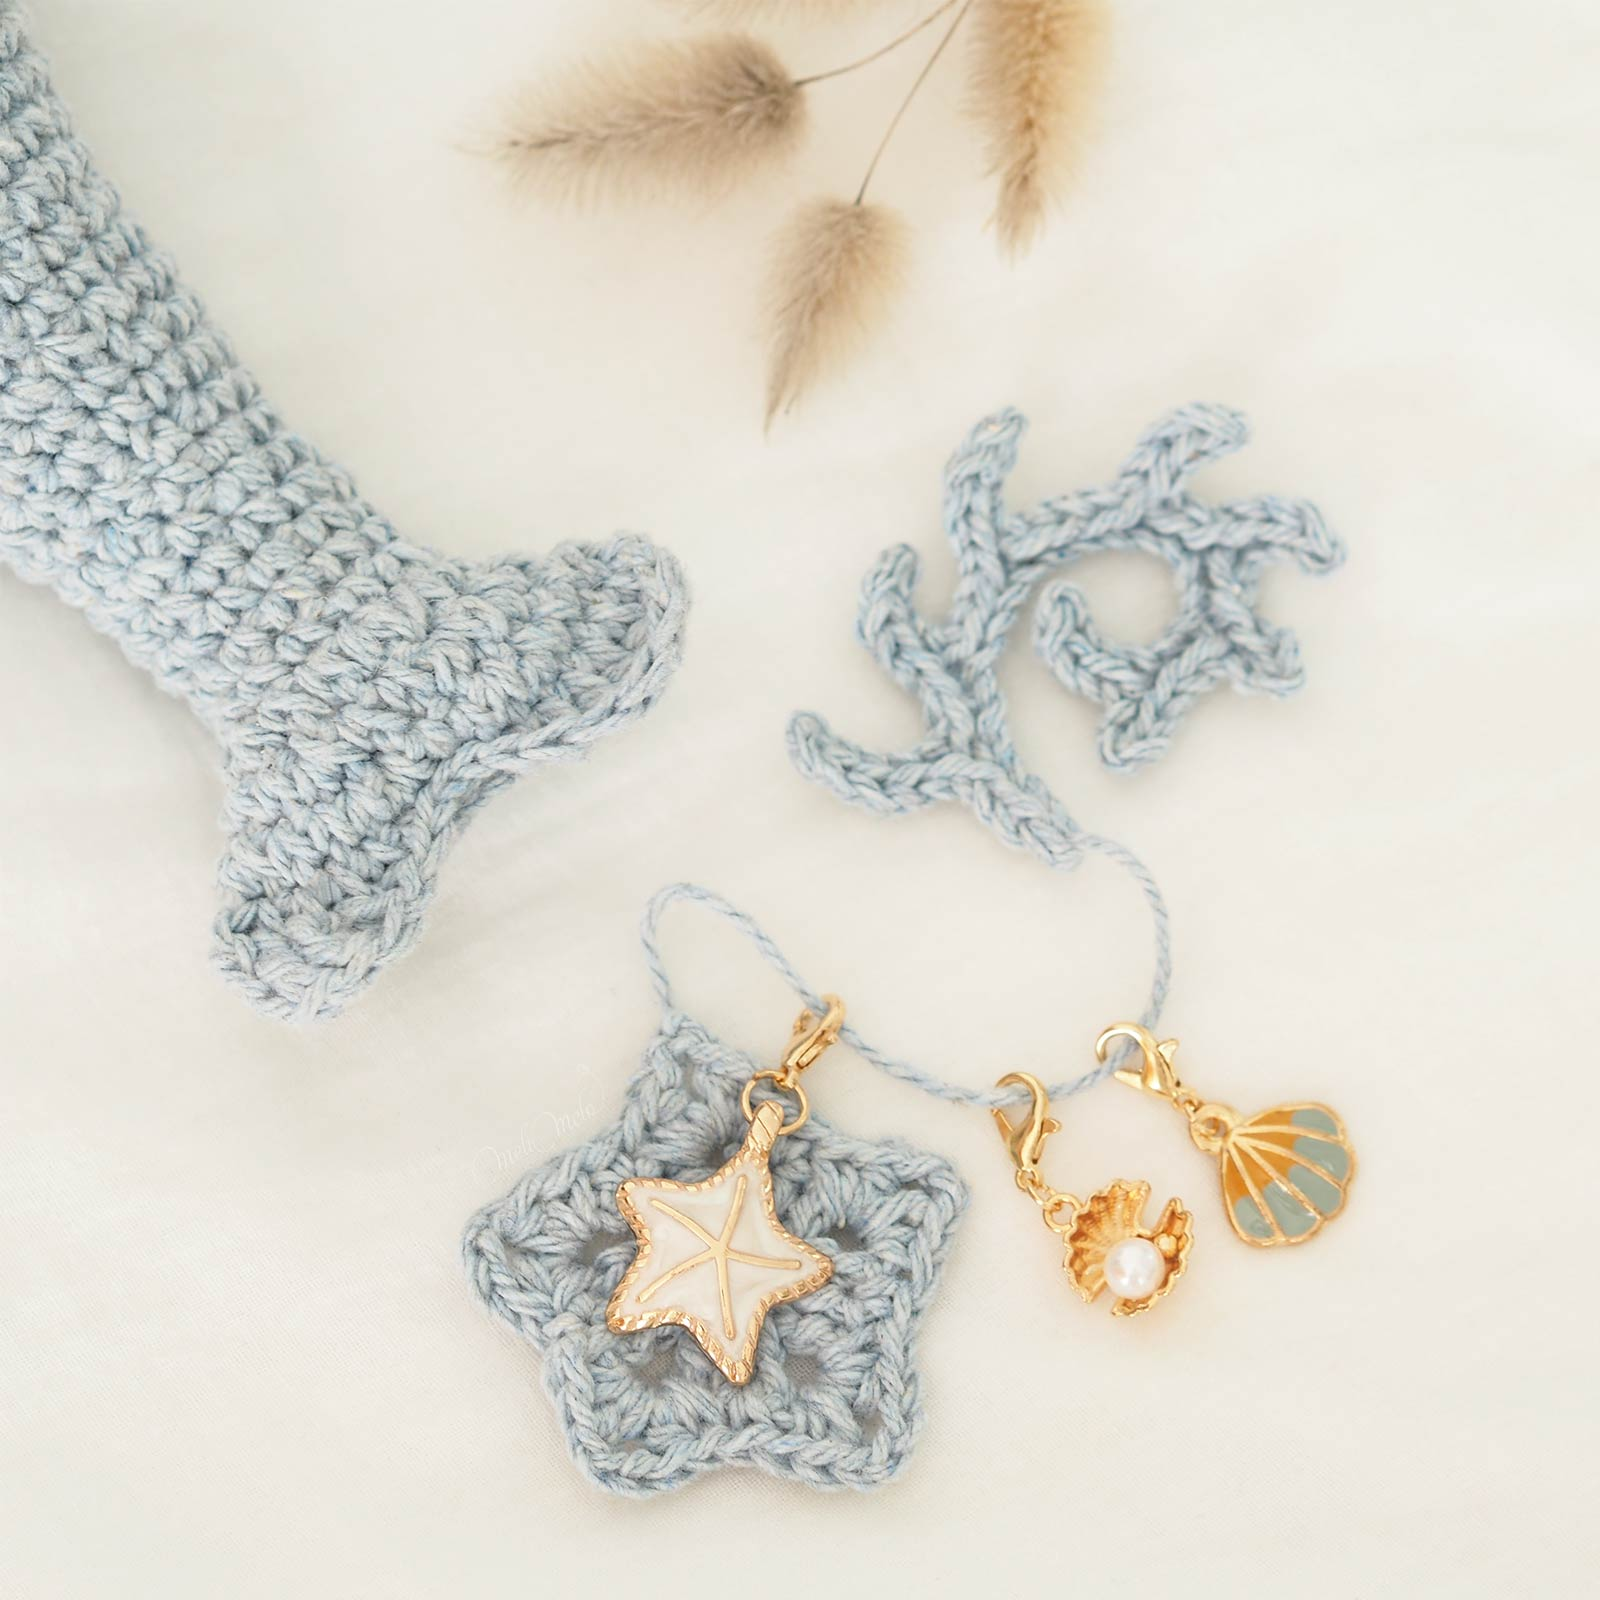 marqueur-tricot-crochet-ocean--coquillage-etoile-mer-kraftiaramarkers